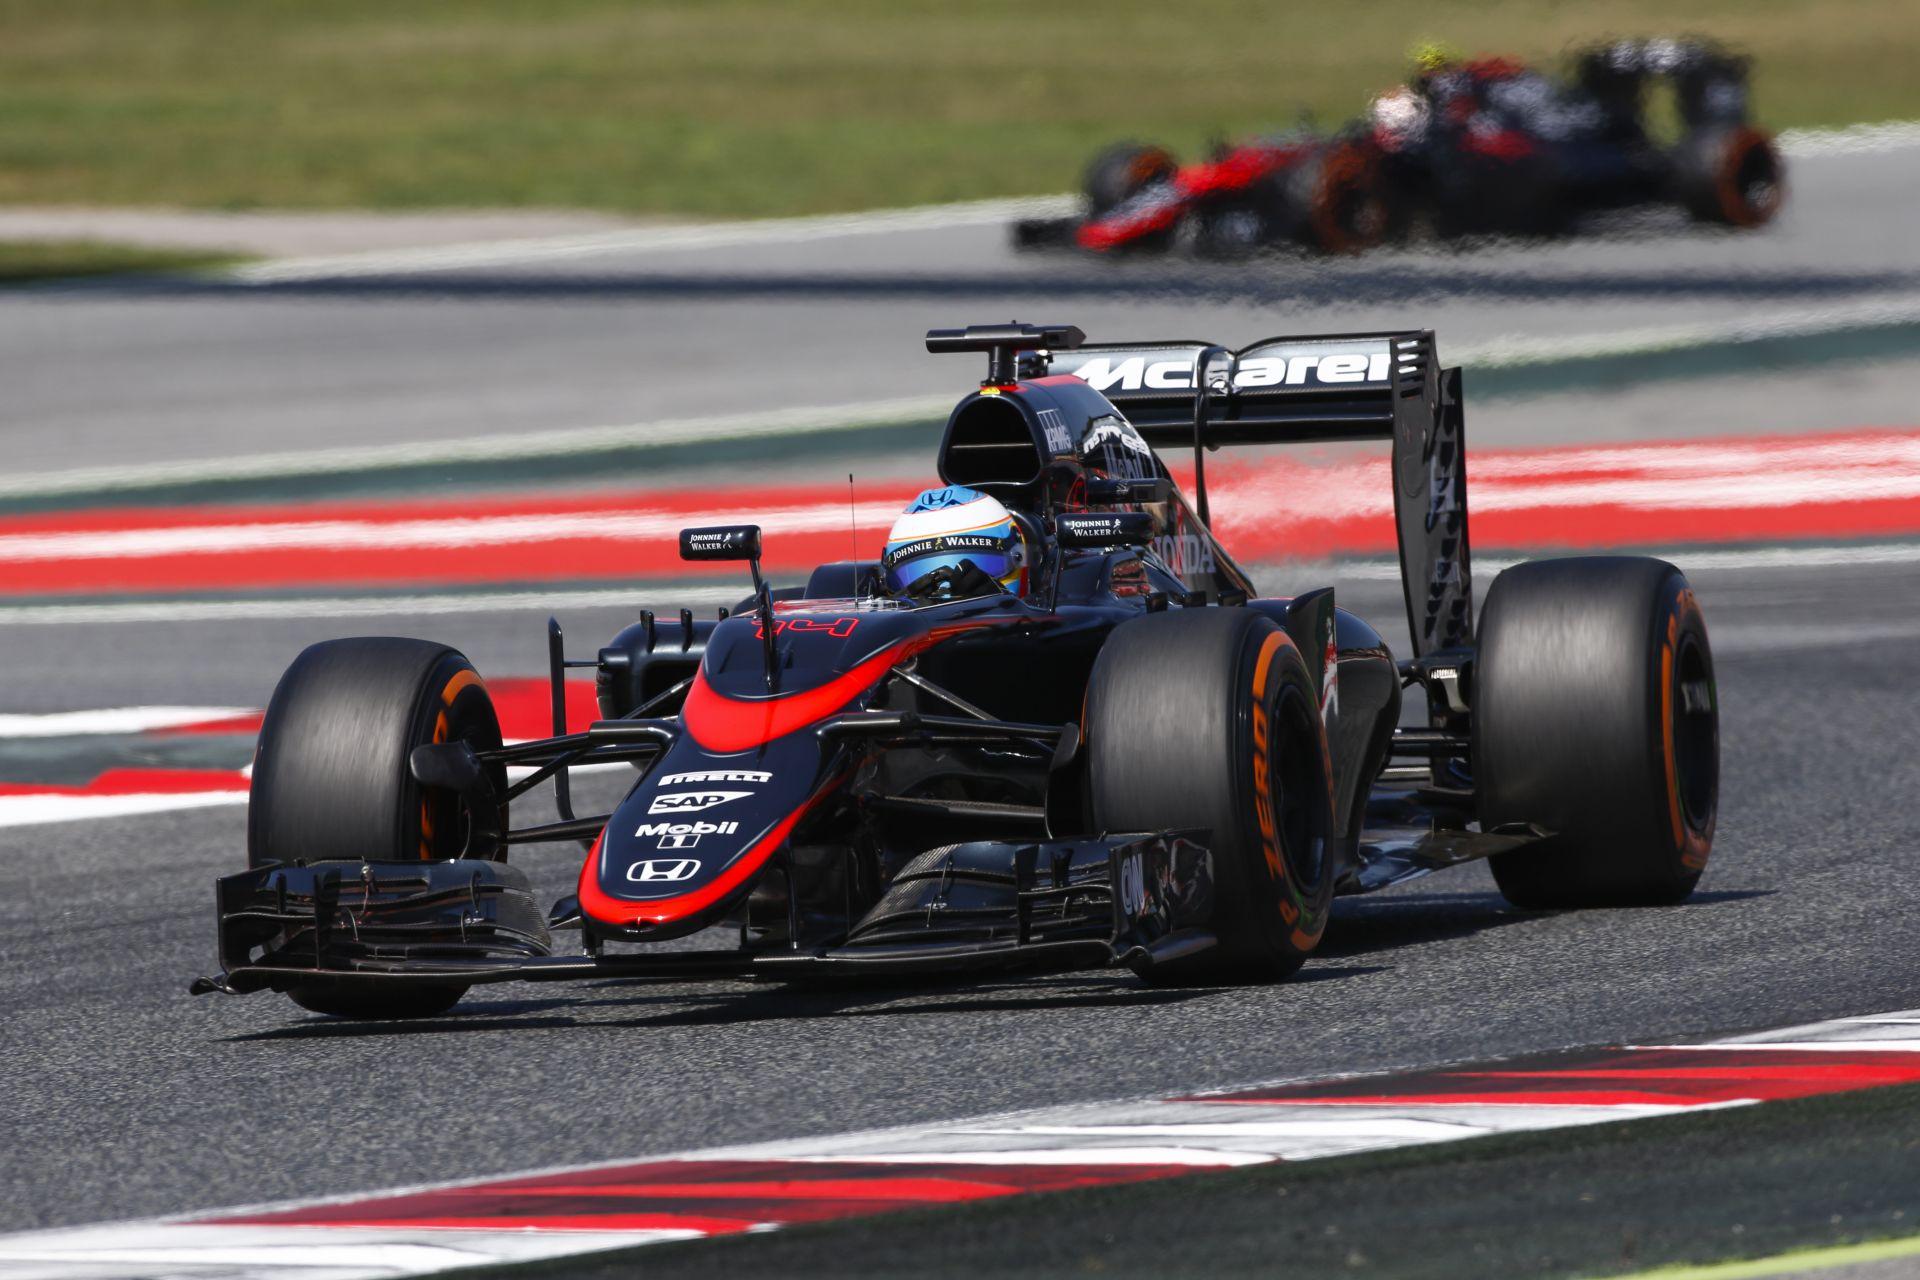 Alonso a magyar rajongók miatt kezdte el tolni a McLarent